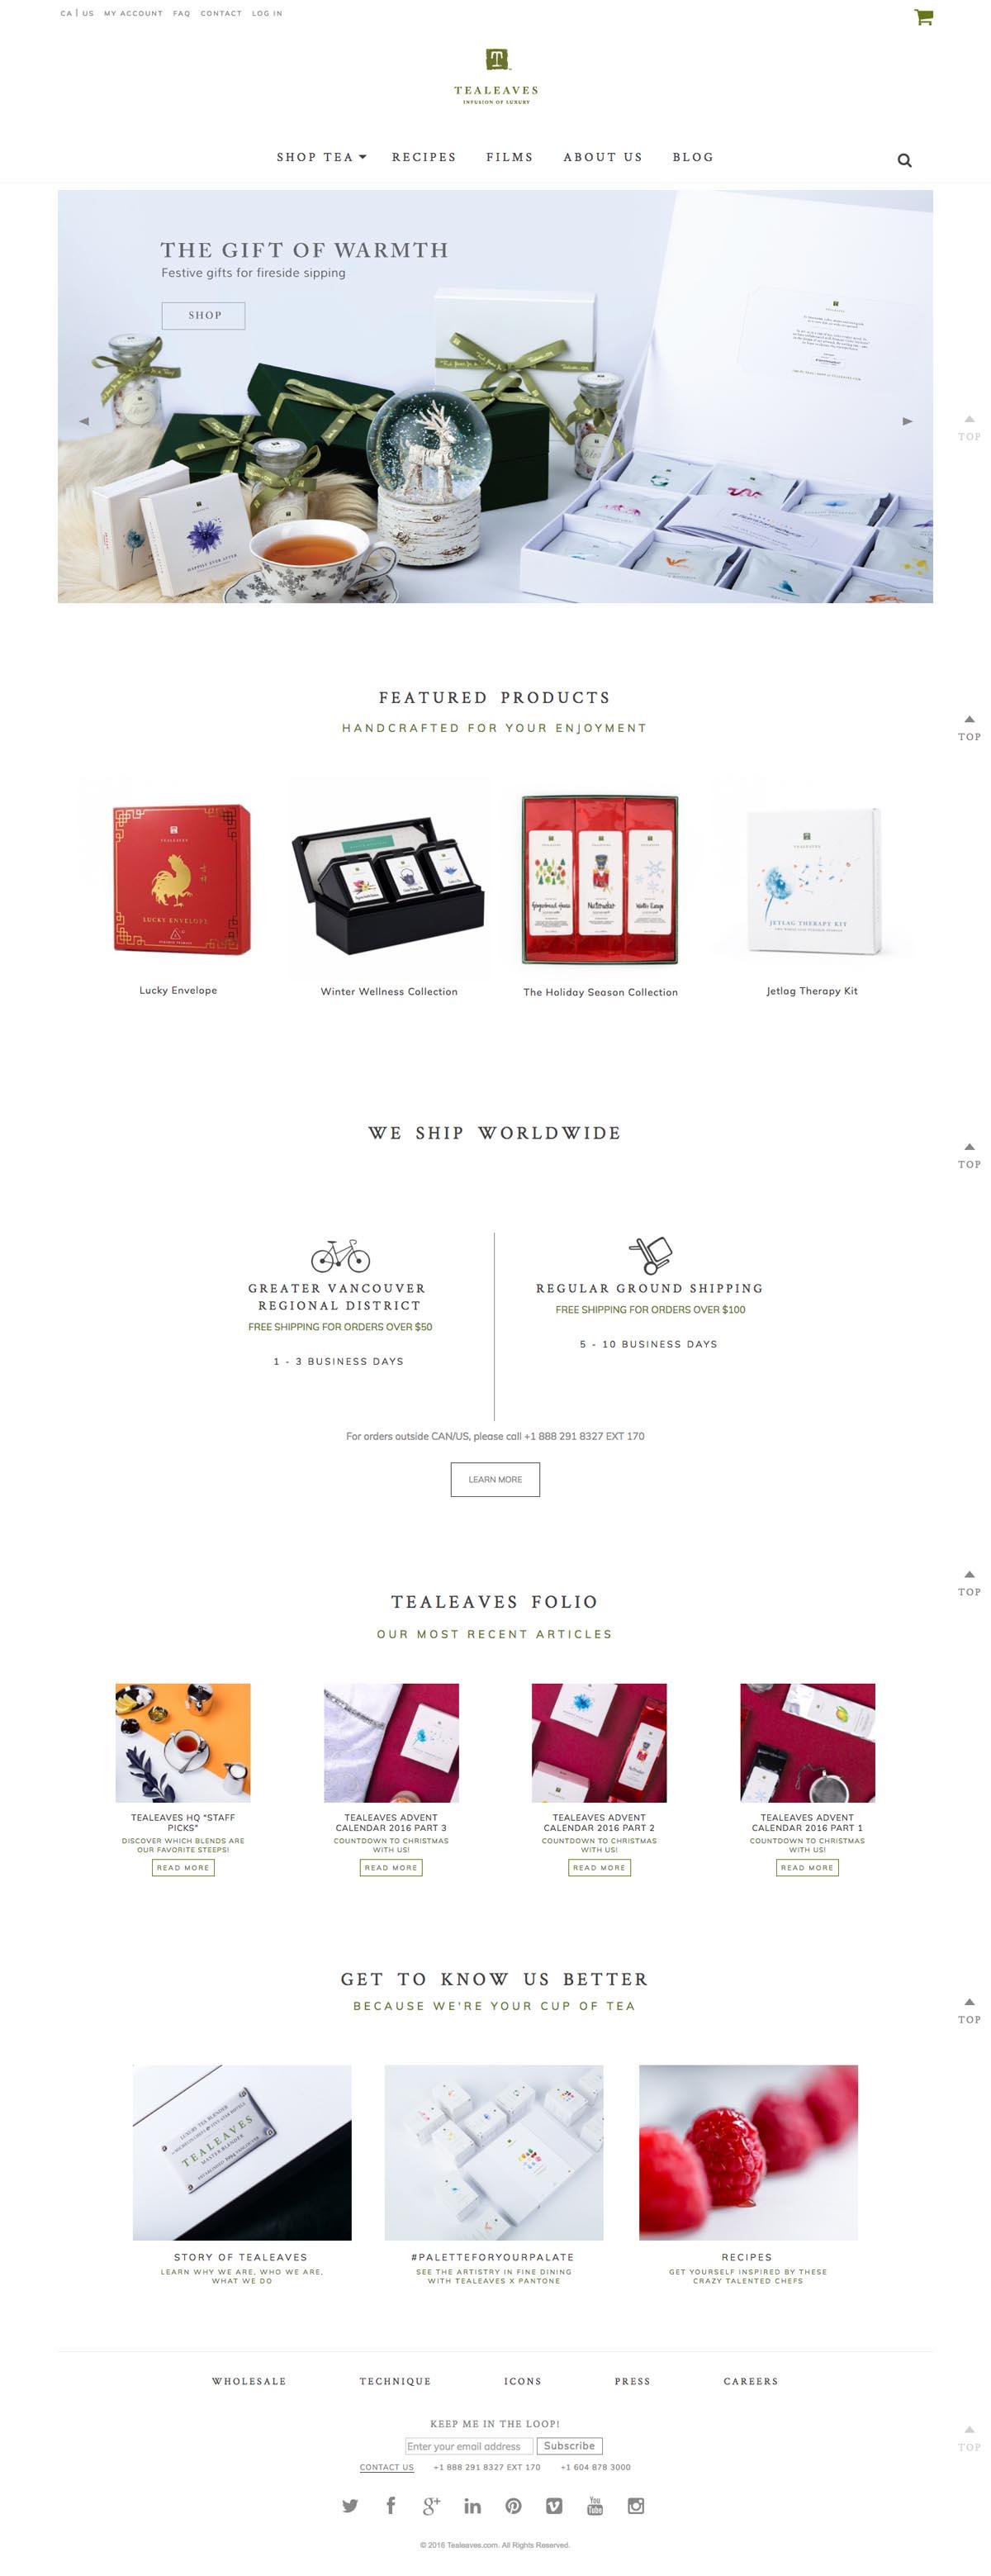 eCommerce website: Tealeaves